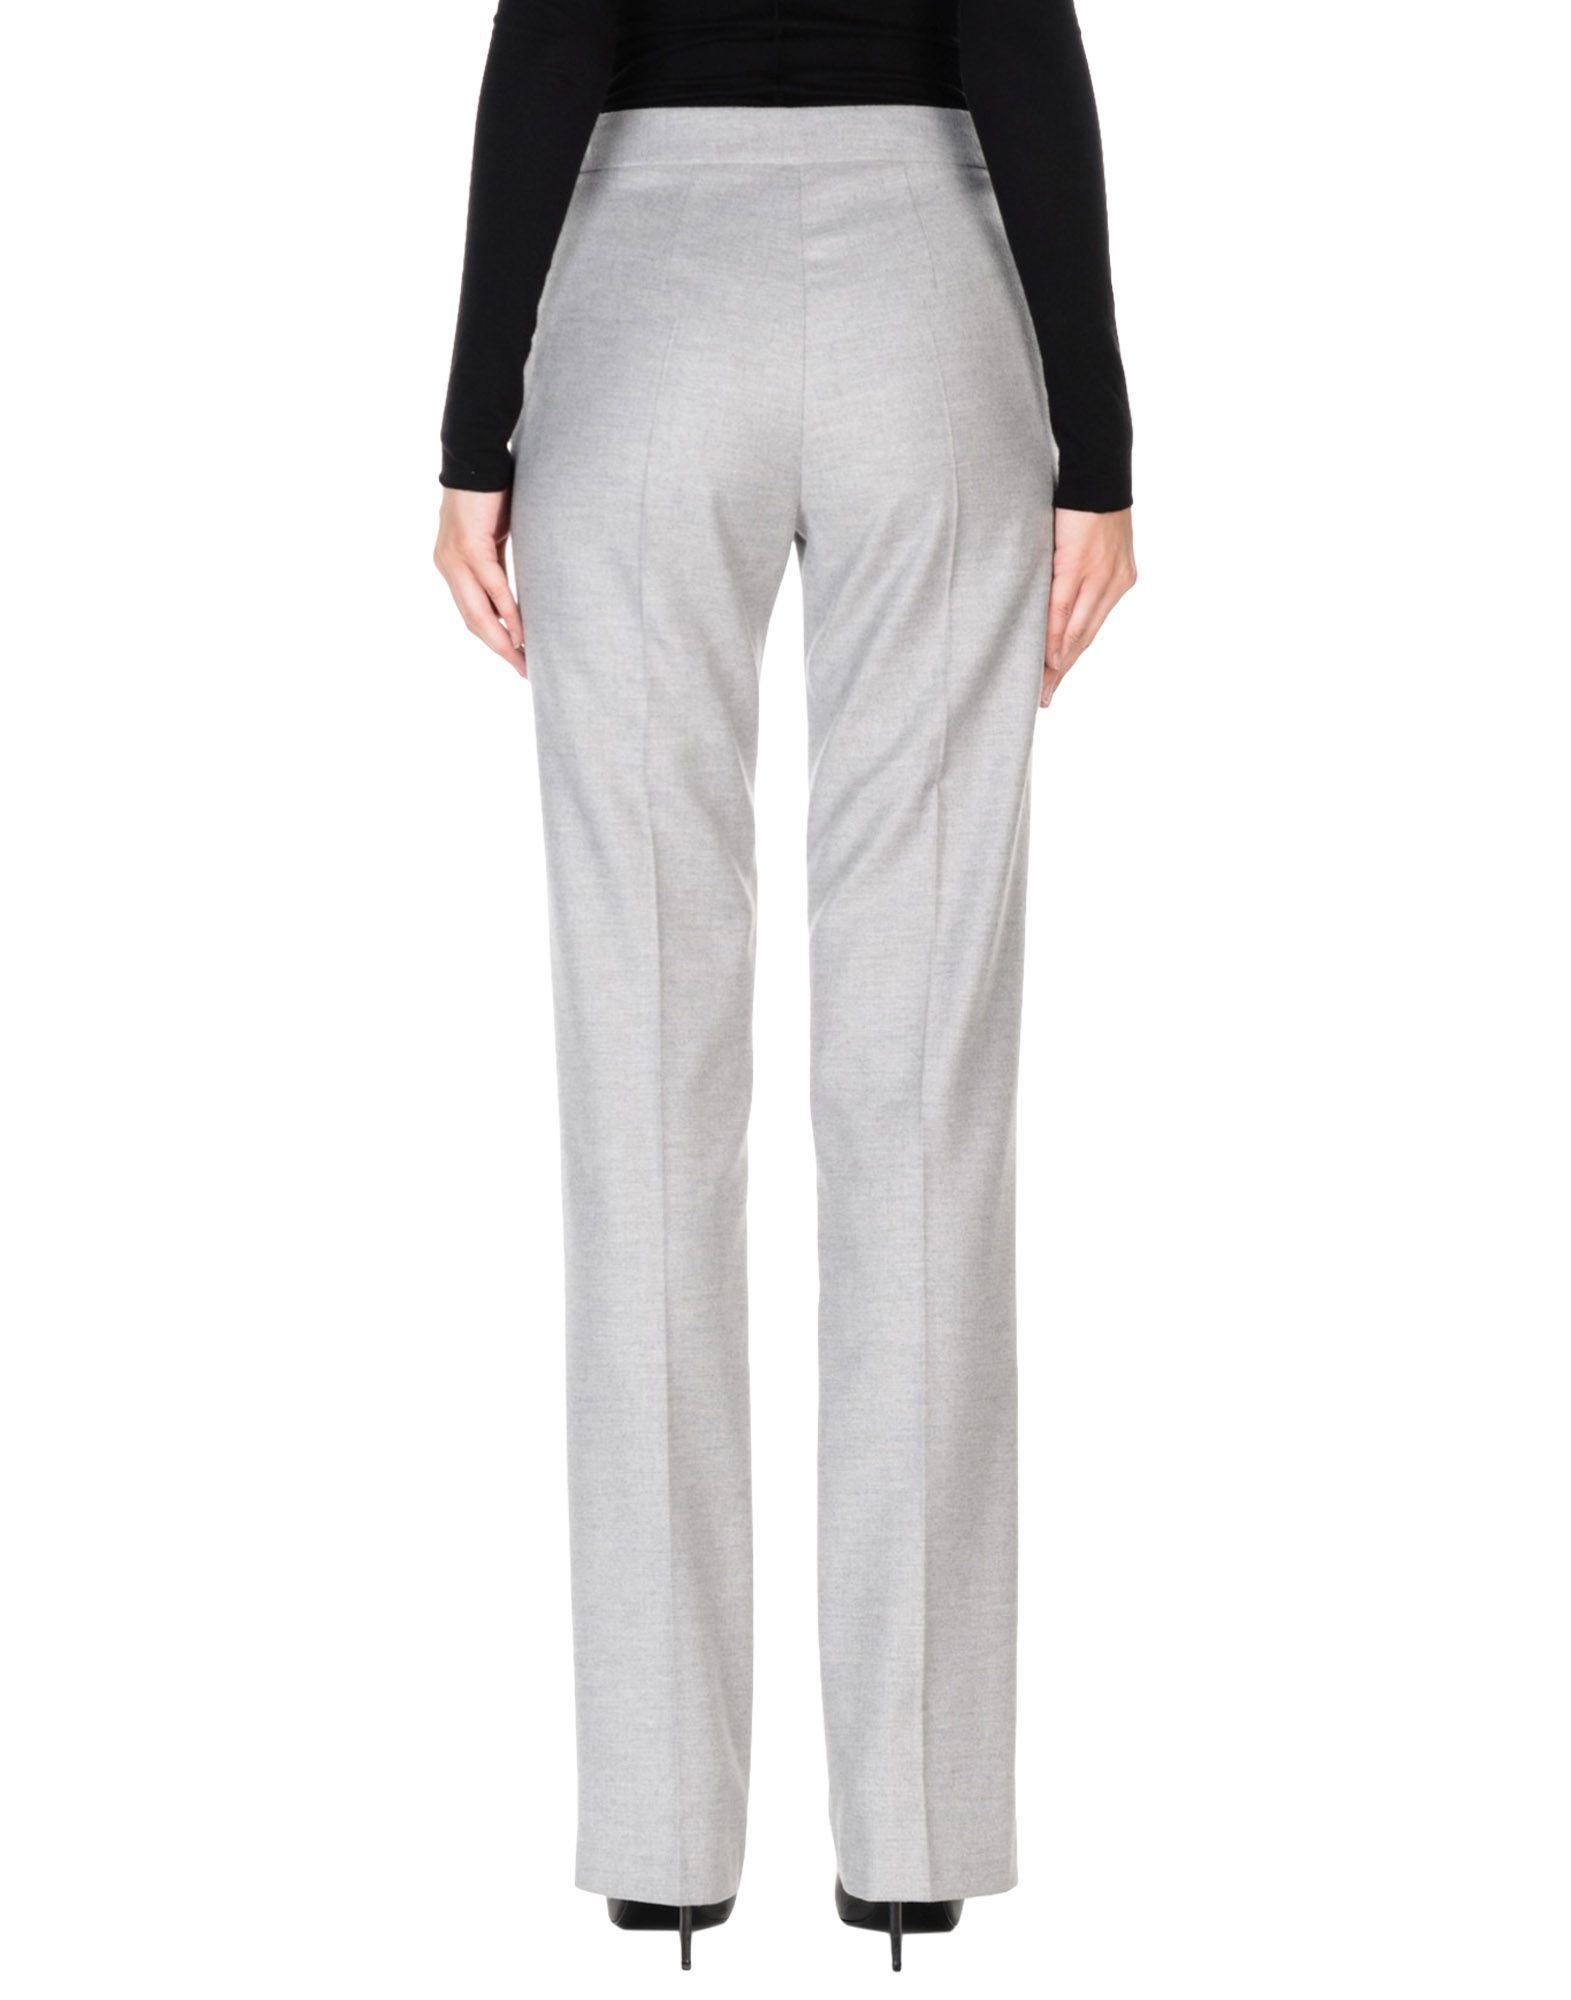 Blumarine Light Grey Wool High Waisted Trousers